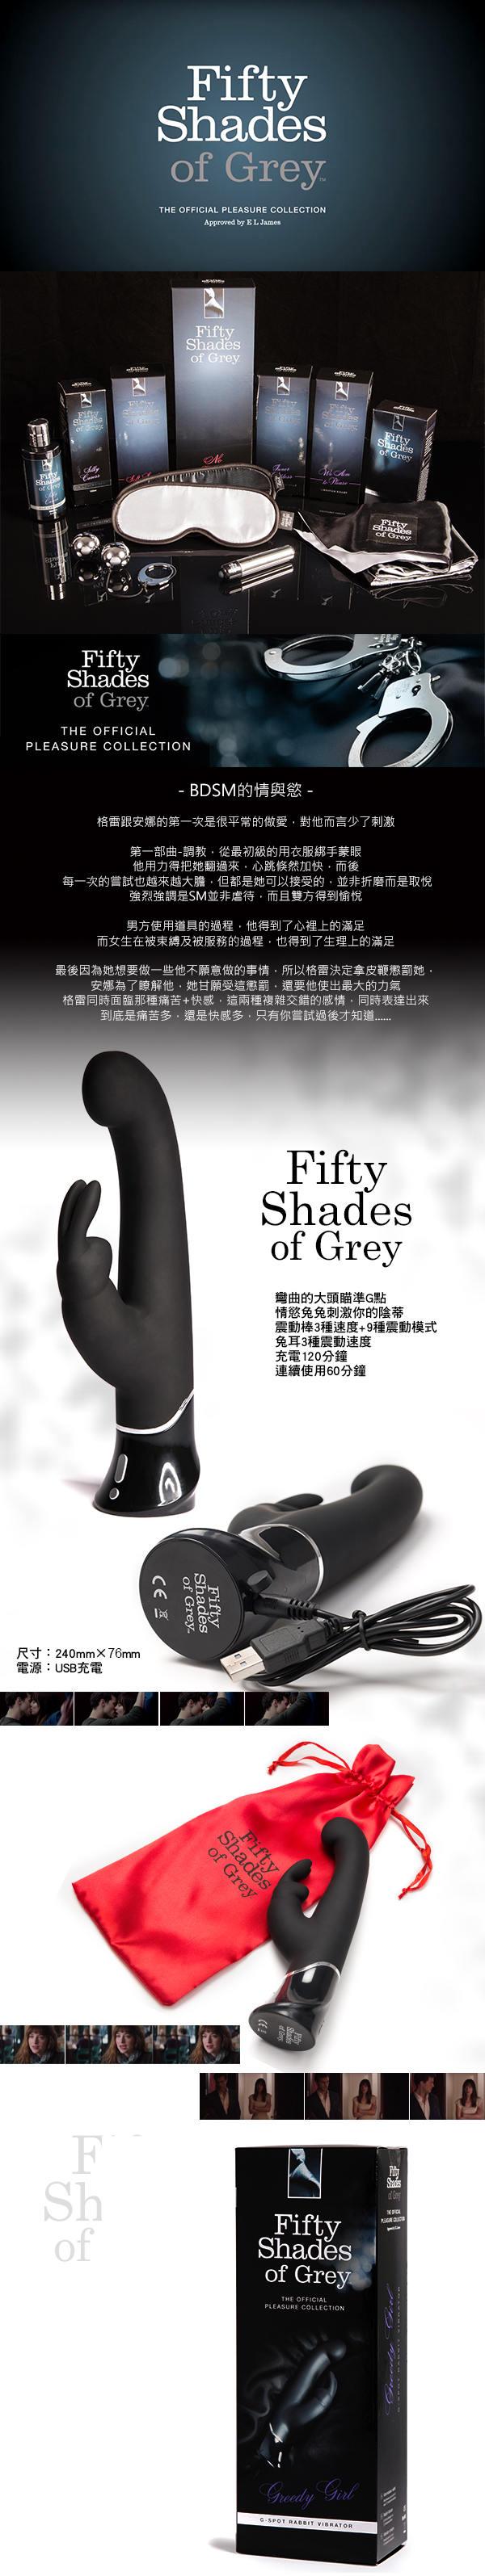 Fifty Shades Of Grey 格雷的五十道陰影 貪心女孩 兔子造型 G點雙震動按摩棒 USB